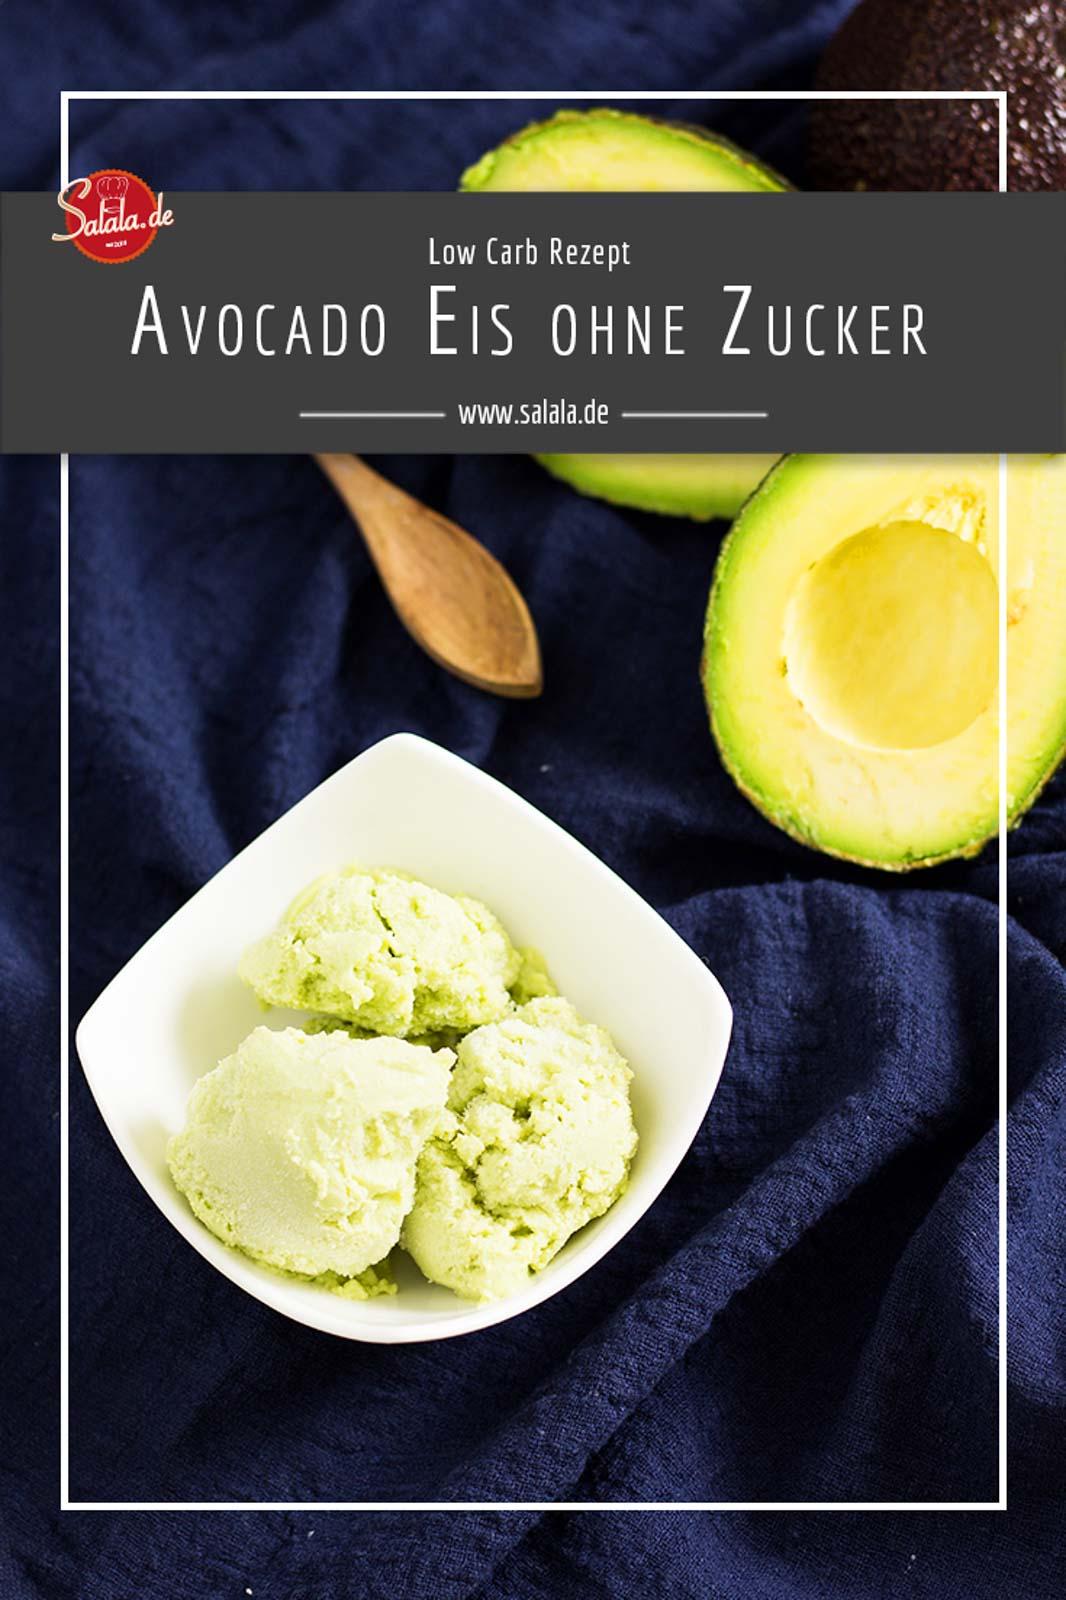 Low Carb Avocado Eis ohne Zucker - by salala.de - selber machen mit Eismaschine Ibywind YF700 Rezept #zuckerfrei #eis #lowcarb